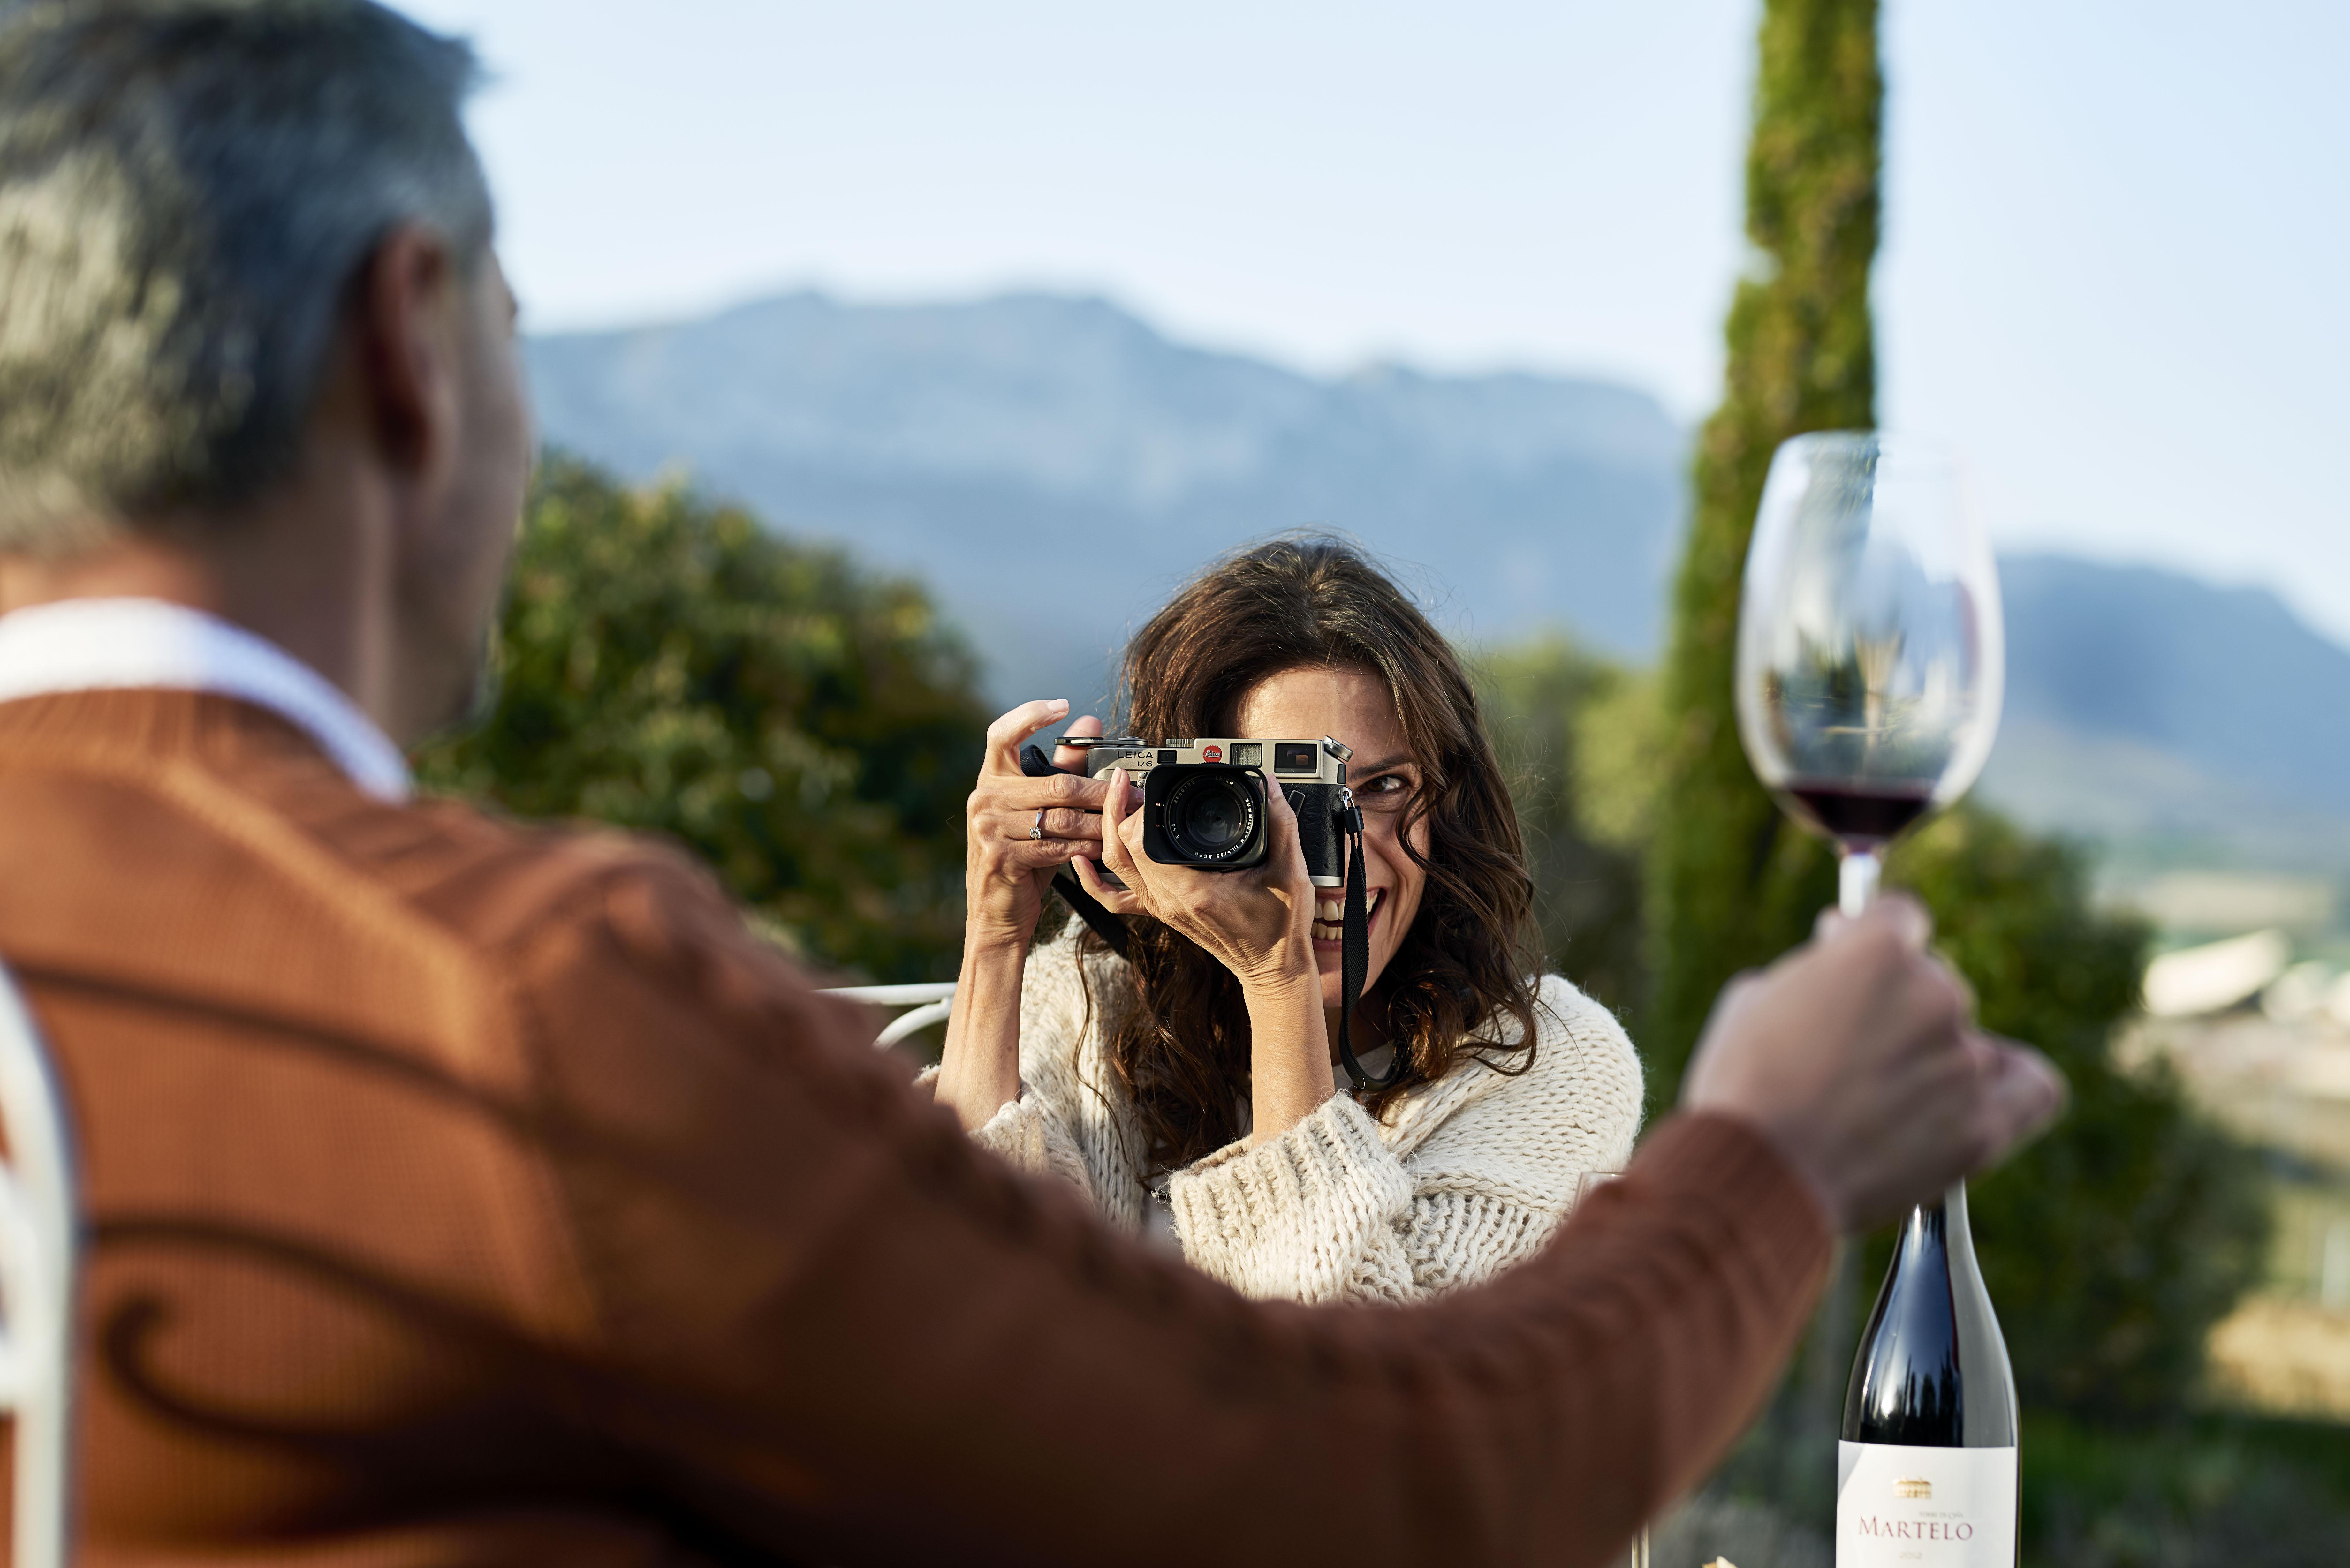 Six ways to experience pure #martelism in La Rioja's winegrowing heartland